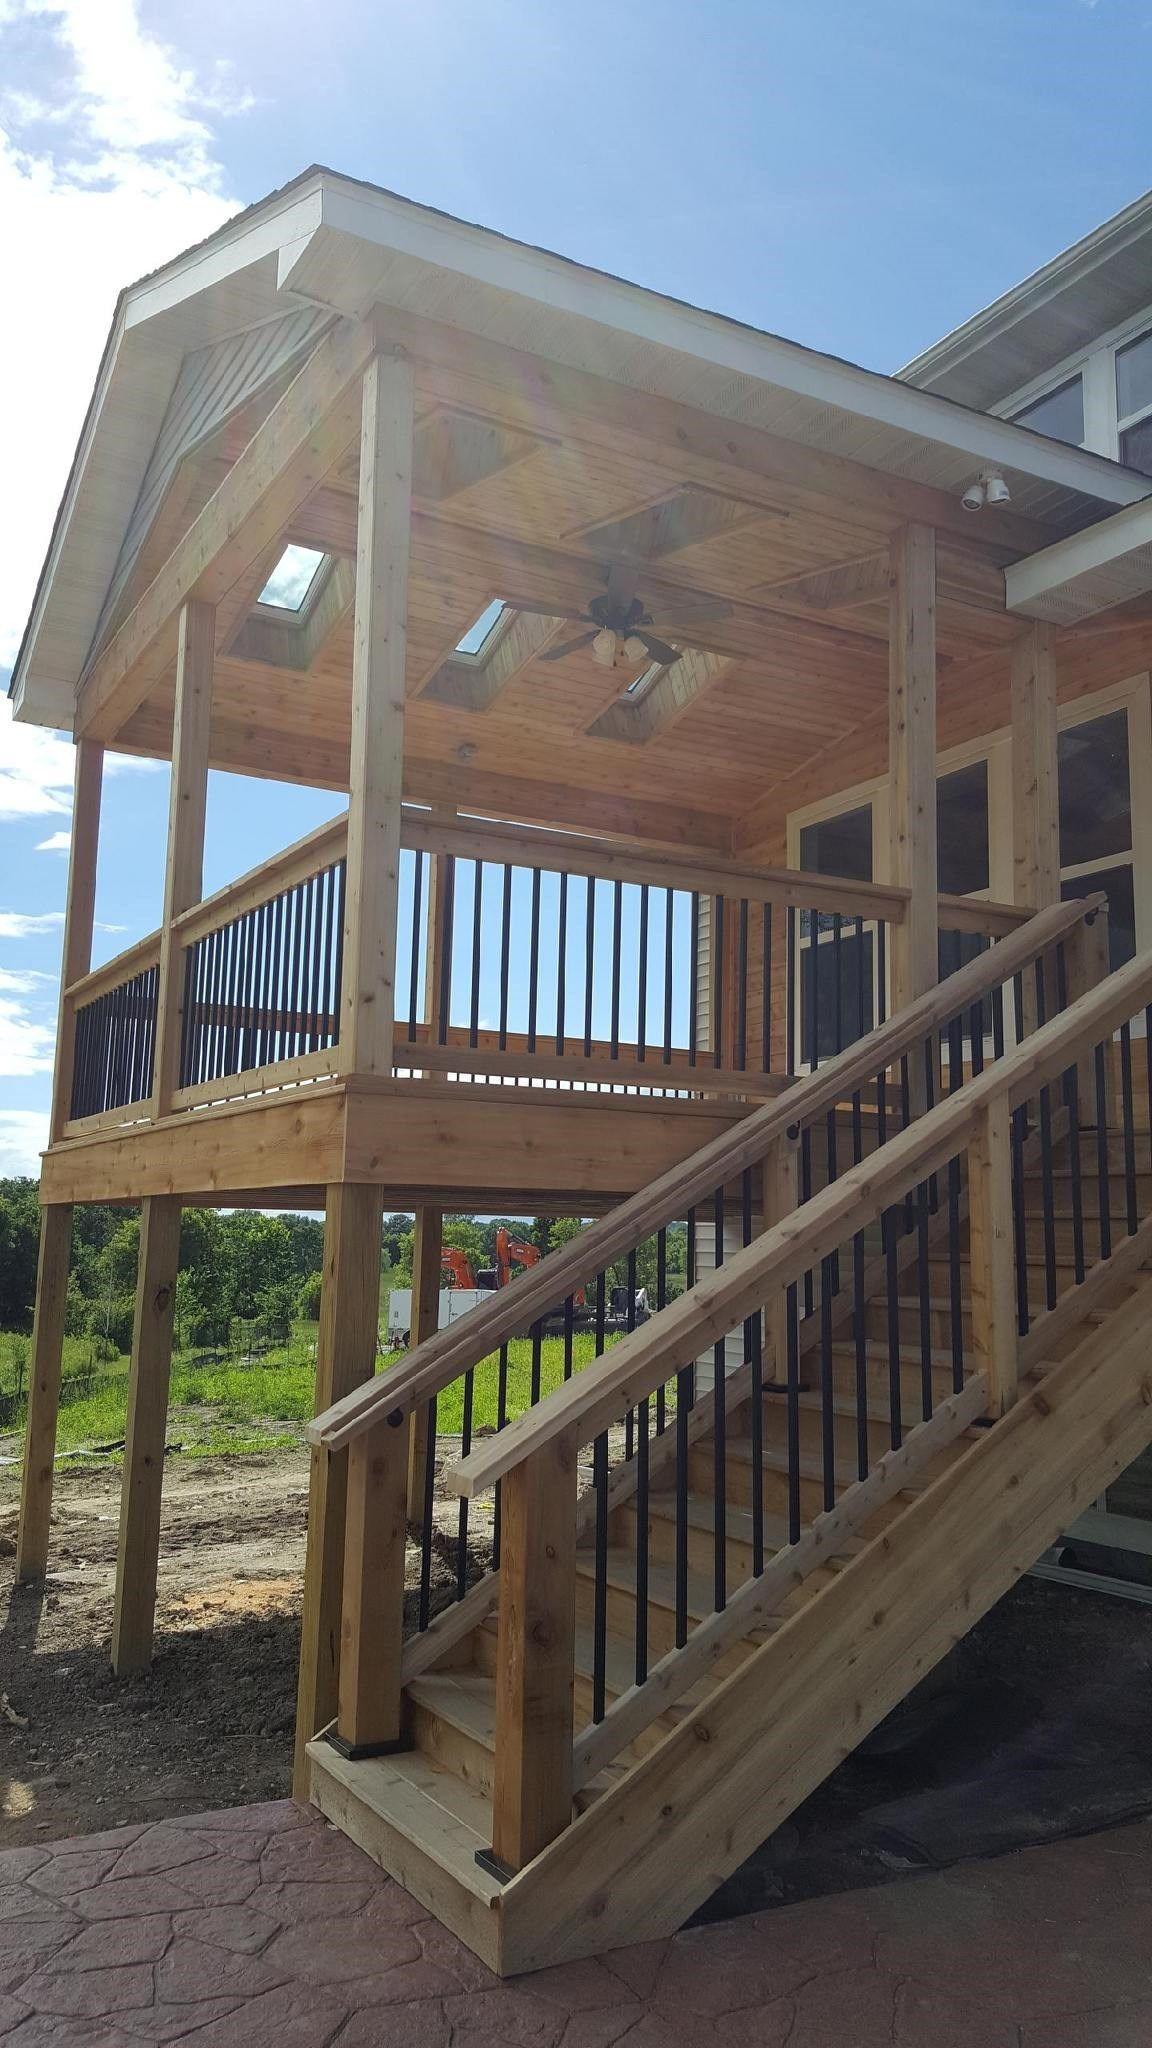 Open Air Cedar Porch - Picture 7293